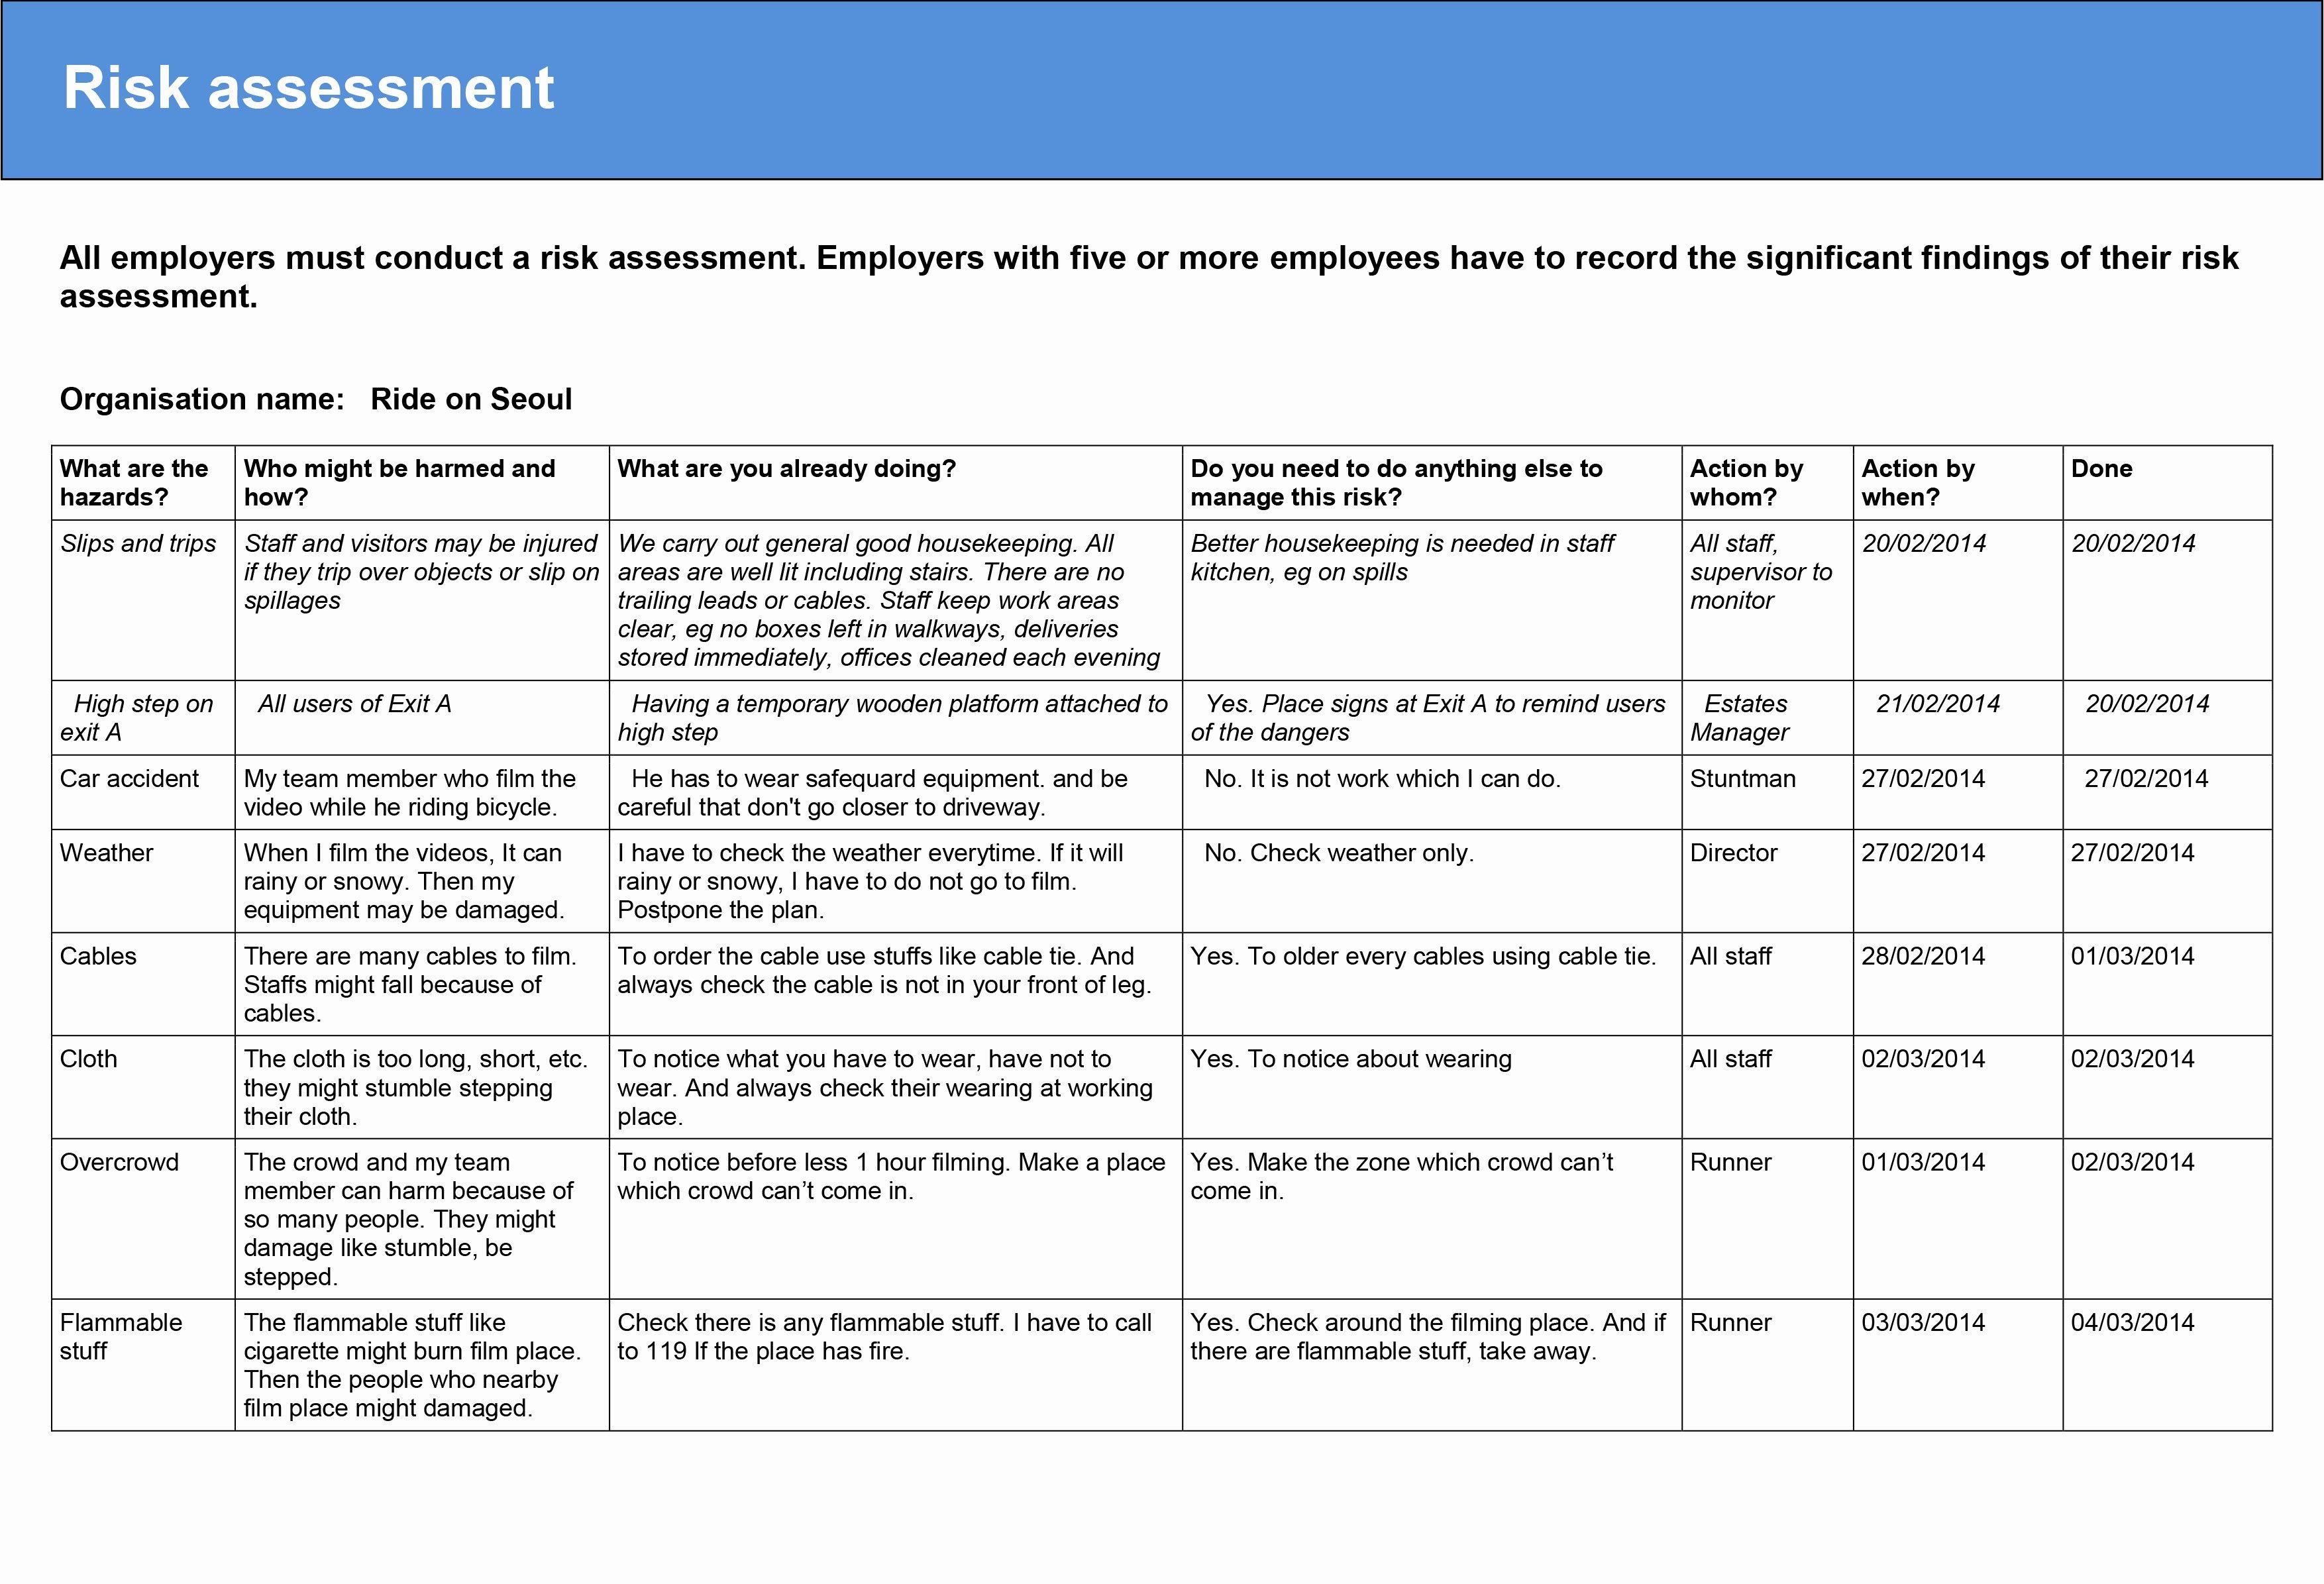 Risk assessment Report Template Inspirational 2 6 Risk assessment Report